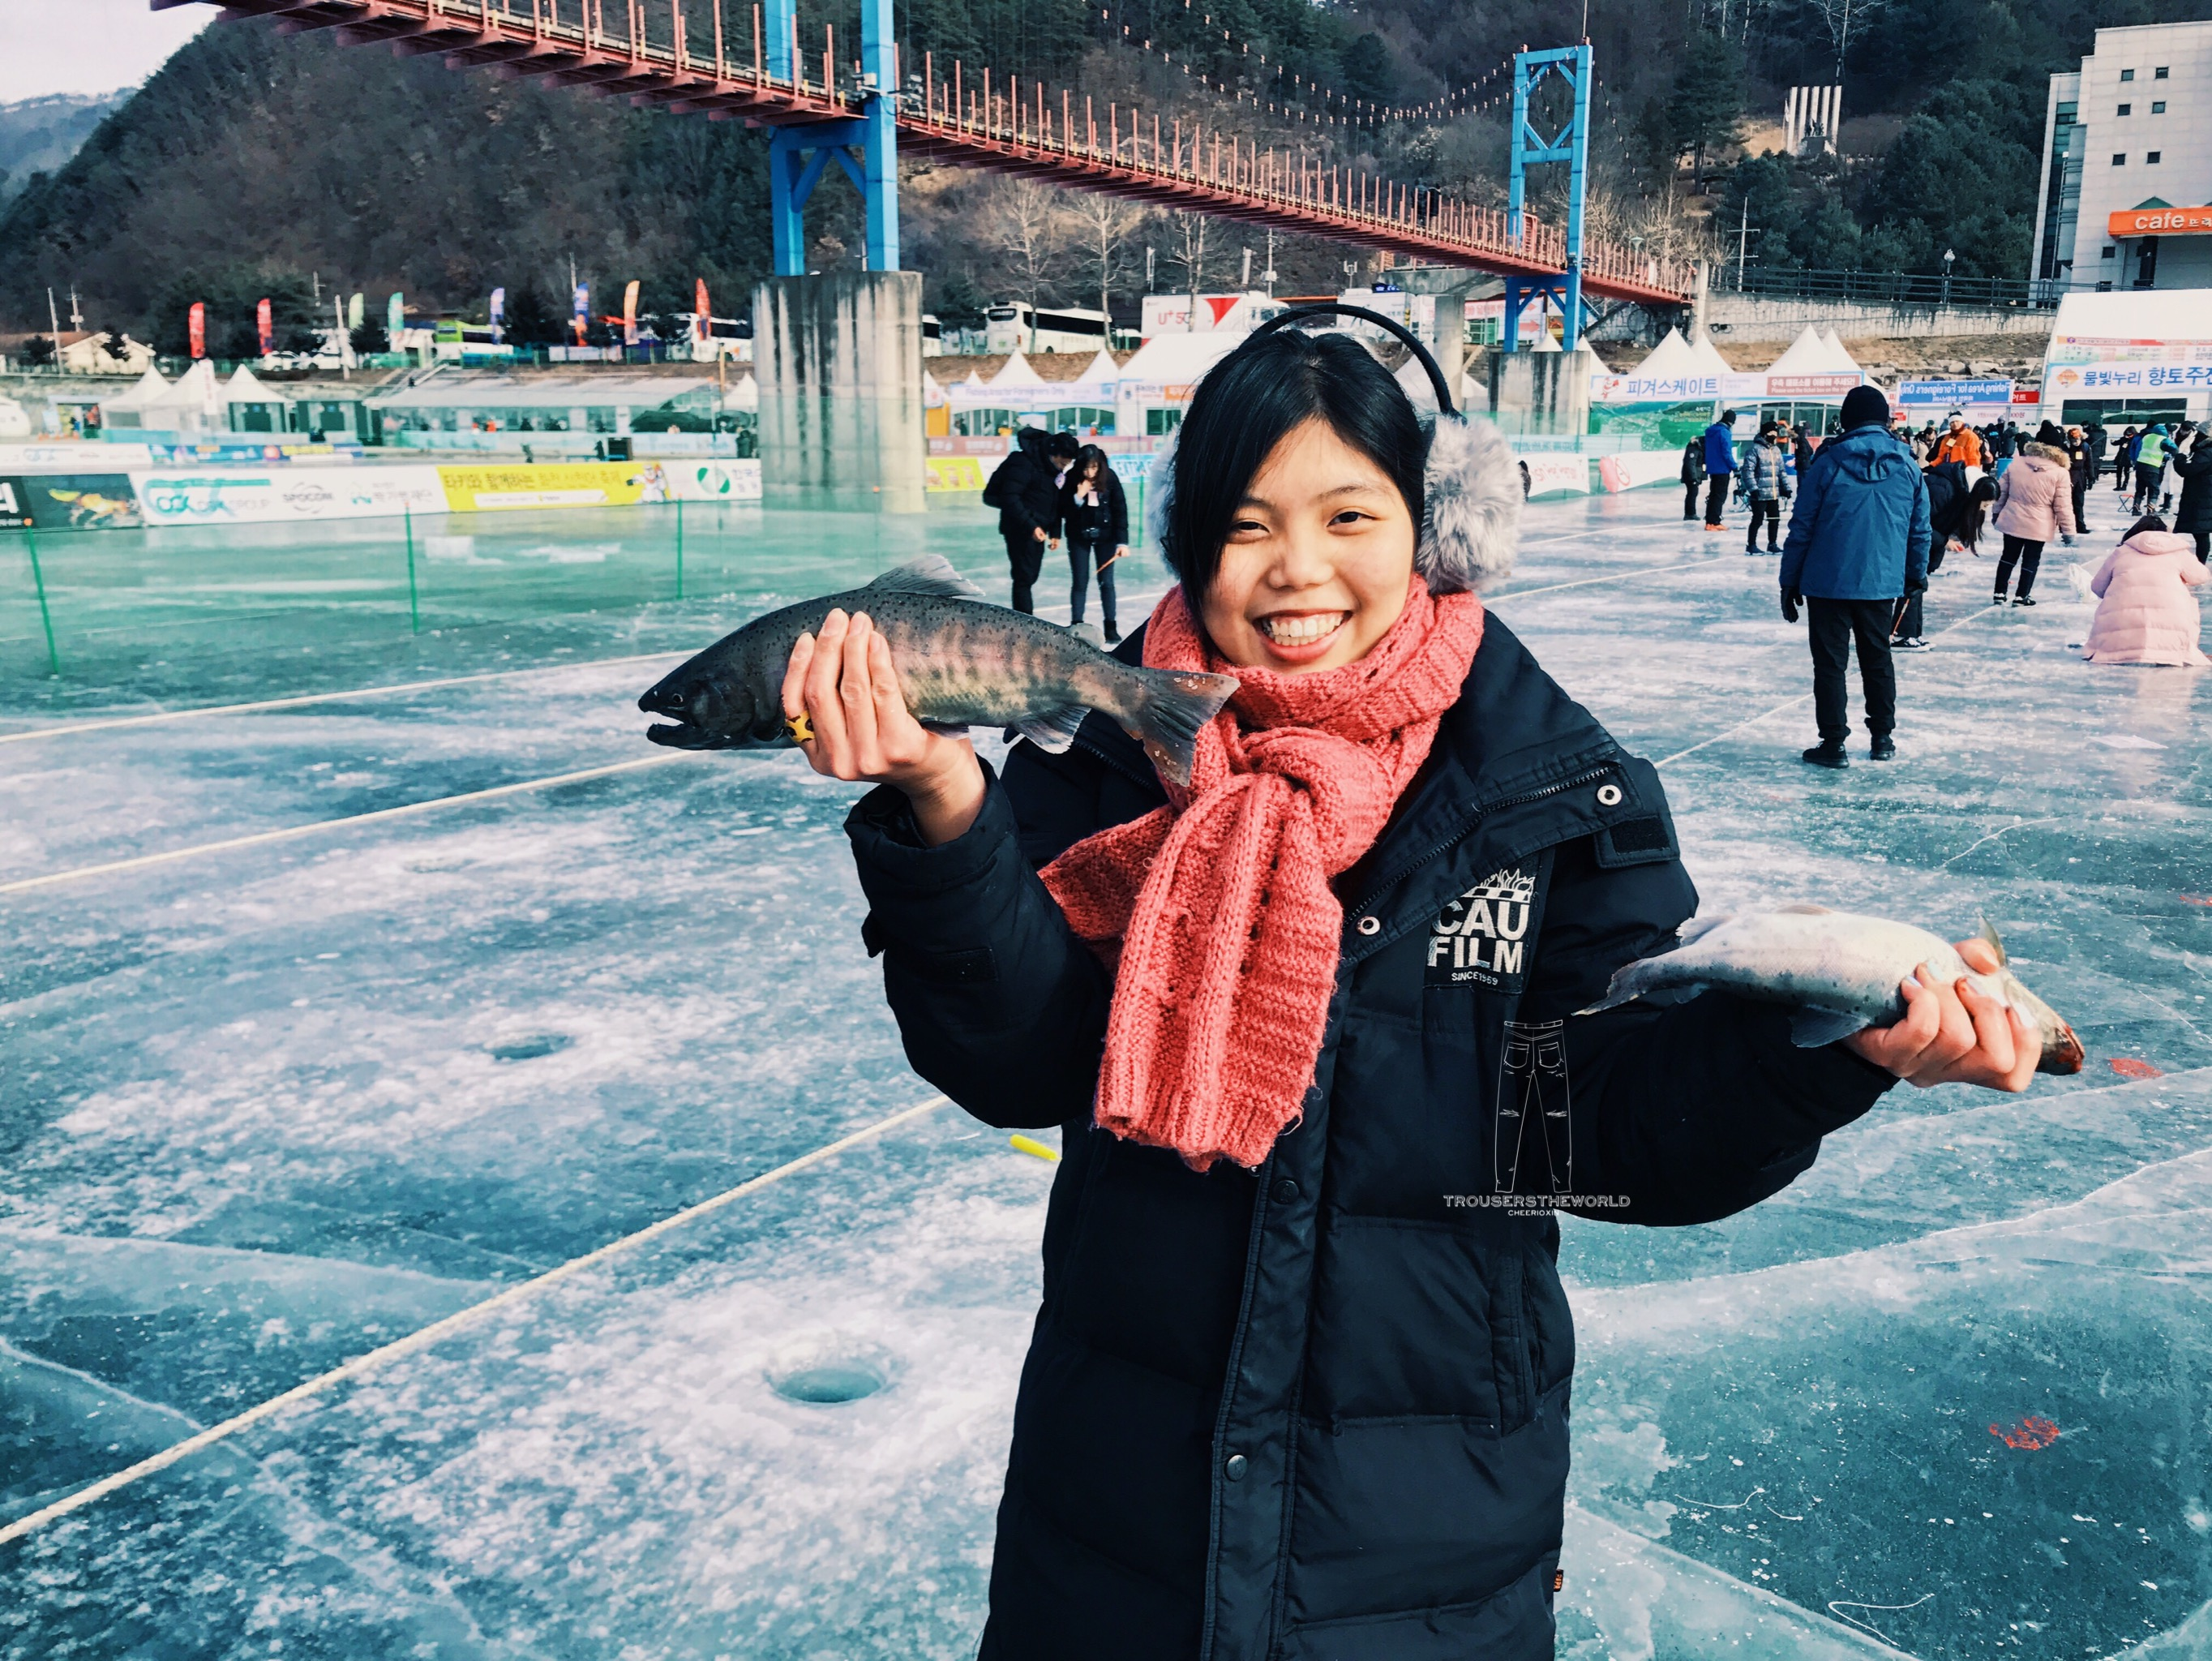 Hwacheon Sancheoneo Ice Festival 華川山鱒魚慶典